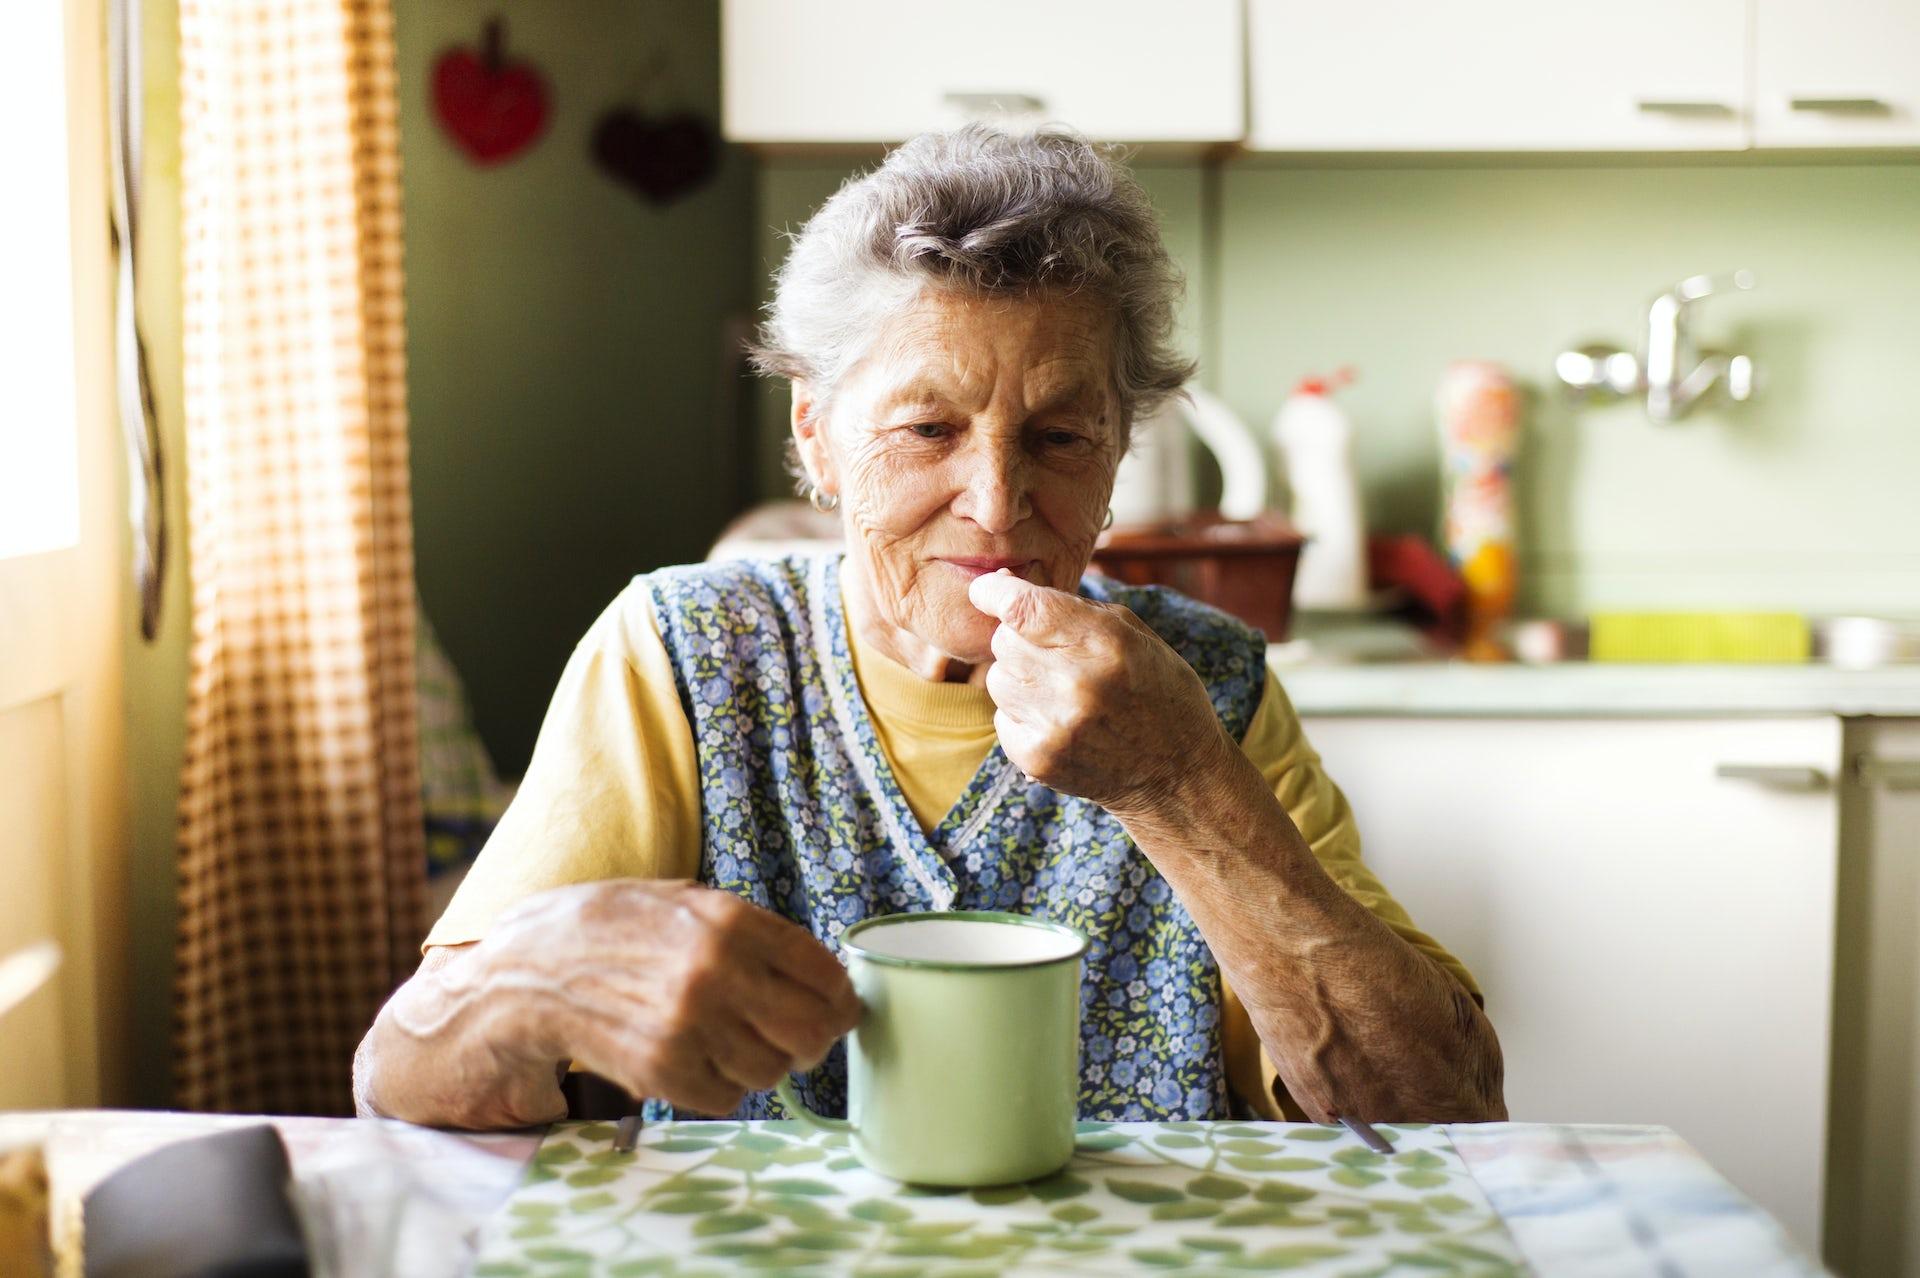 نتيجة بحث الصور عن Daily low-dose aspirin does not reduce heart-attack risk in healthy people